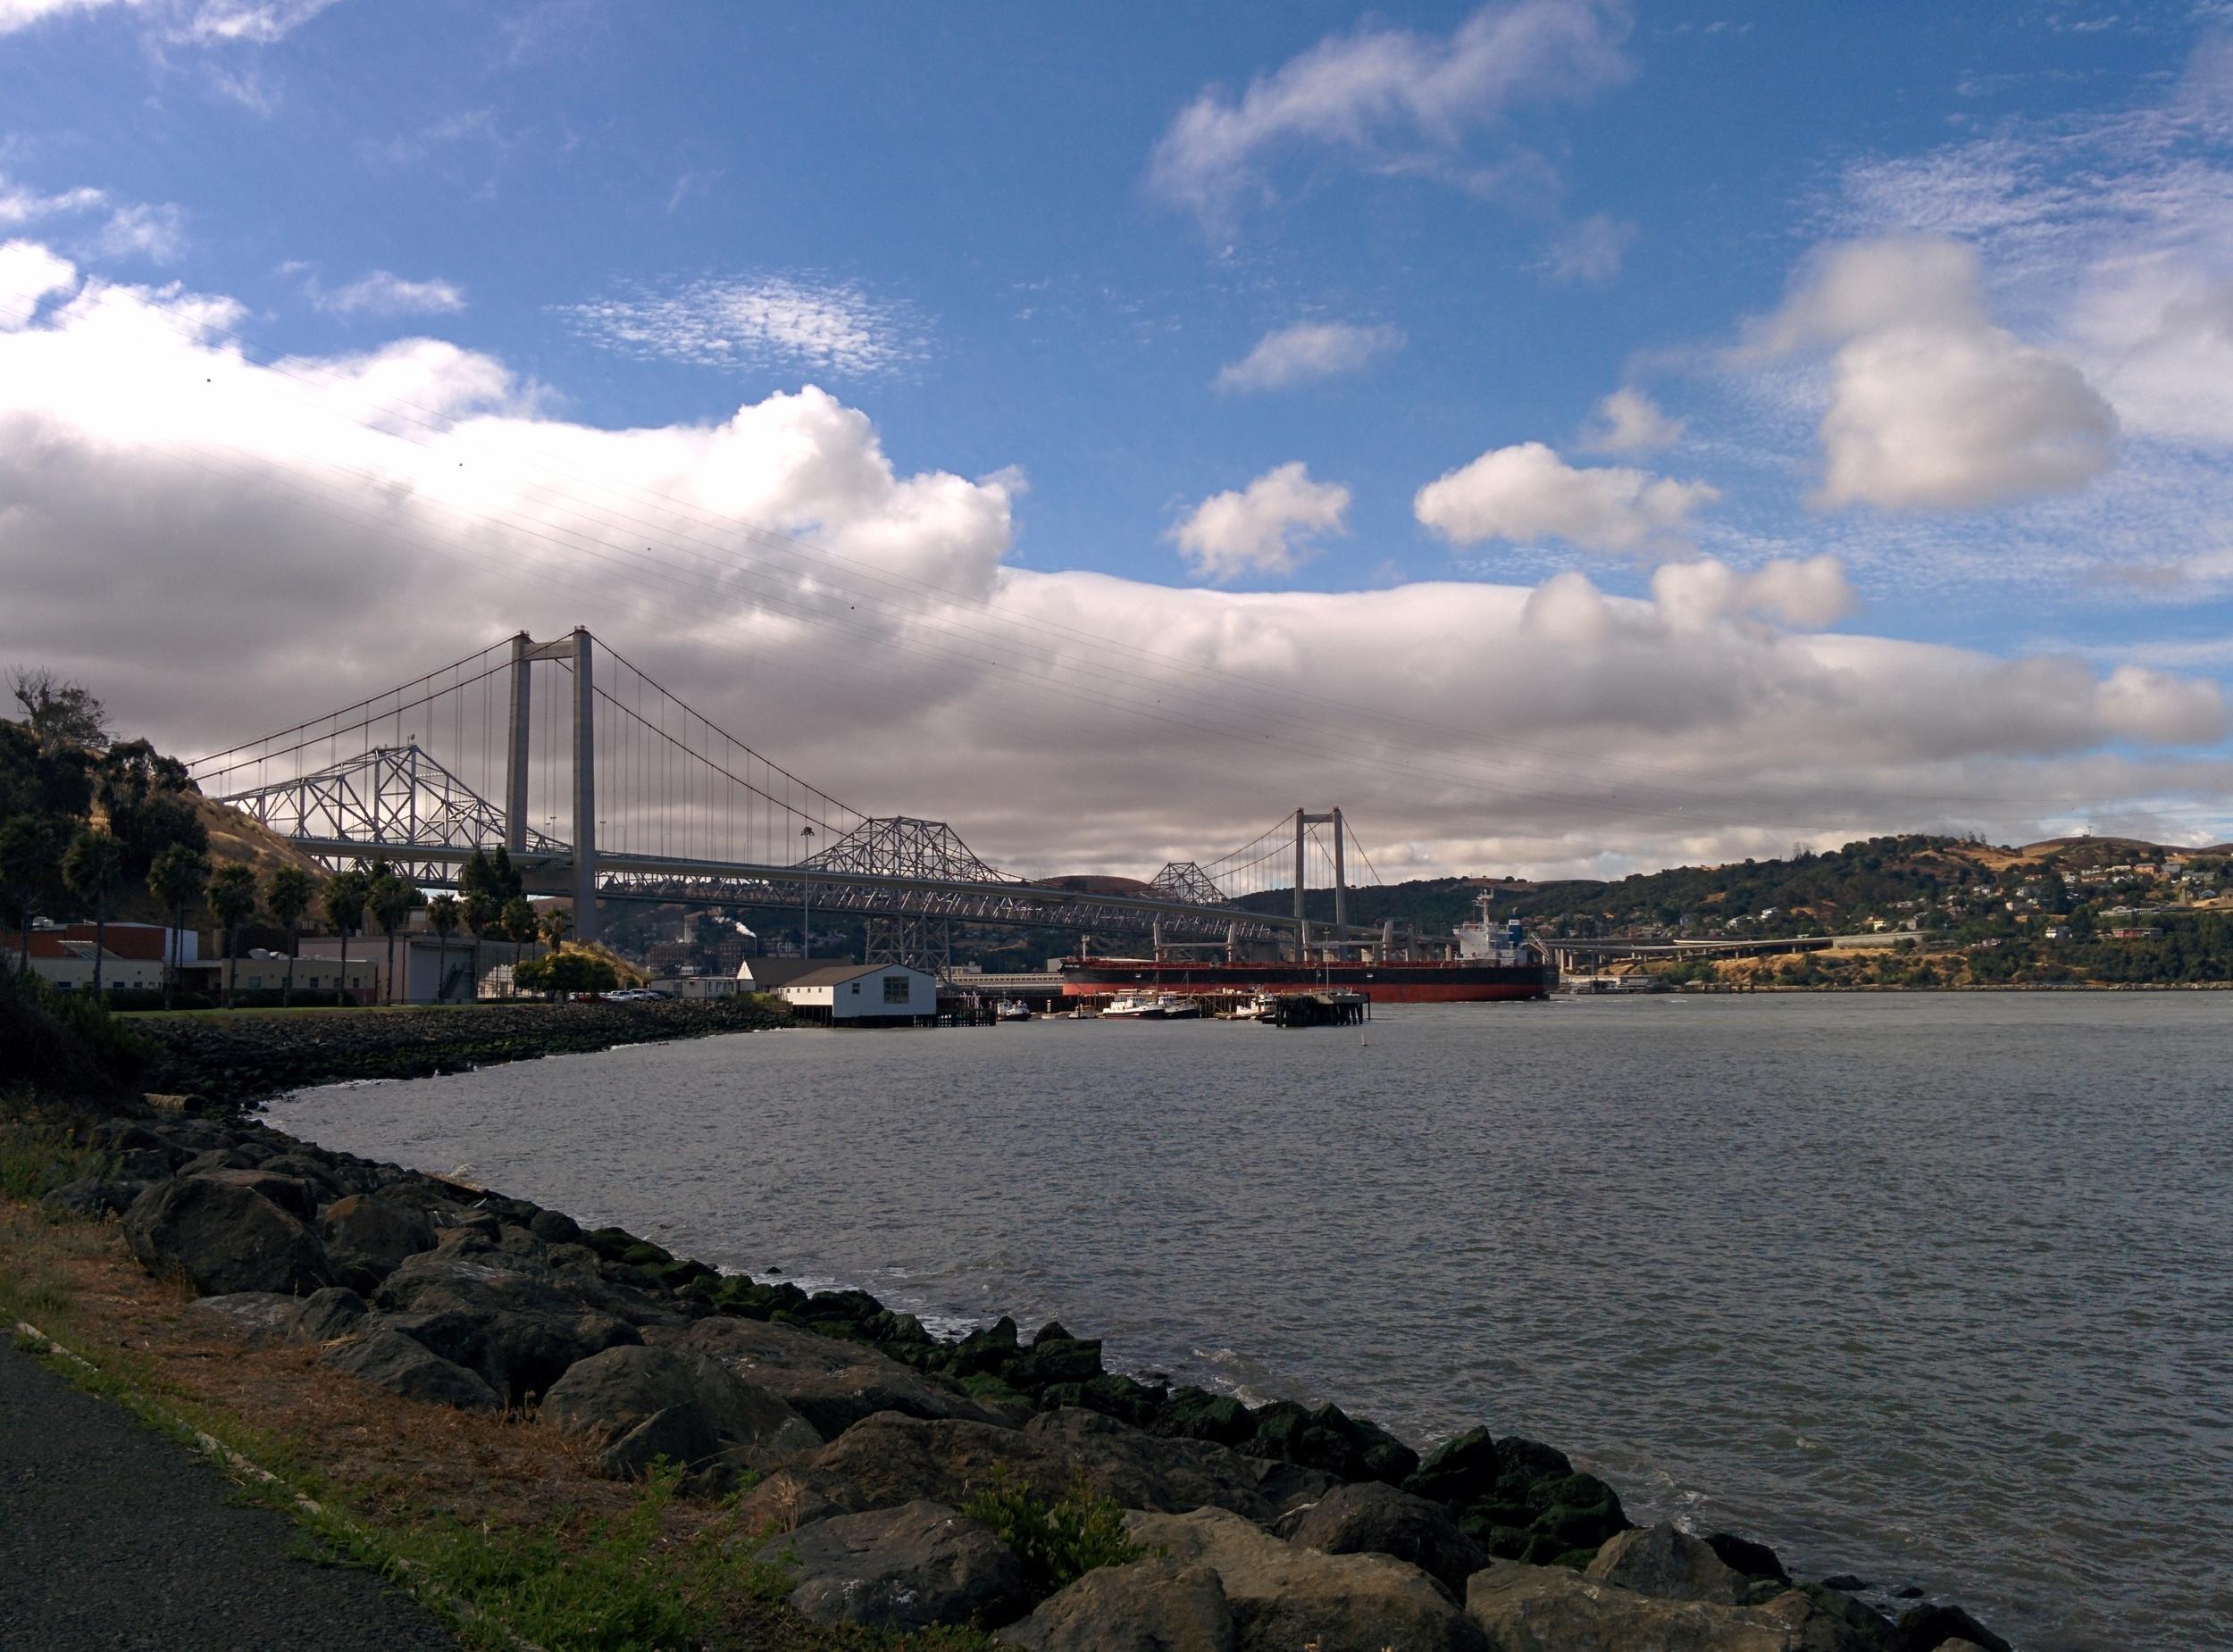 Bay Bridge, old and new.